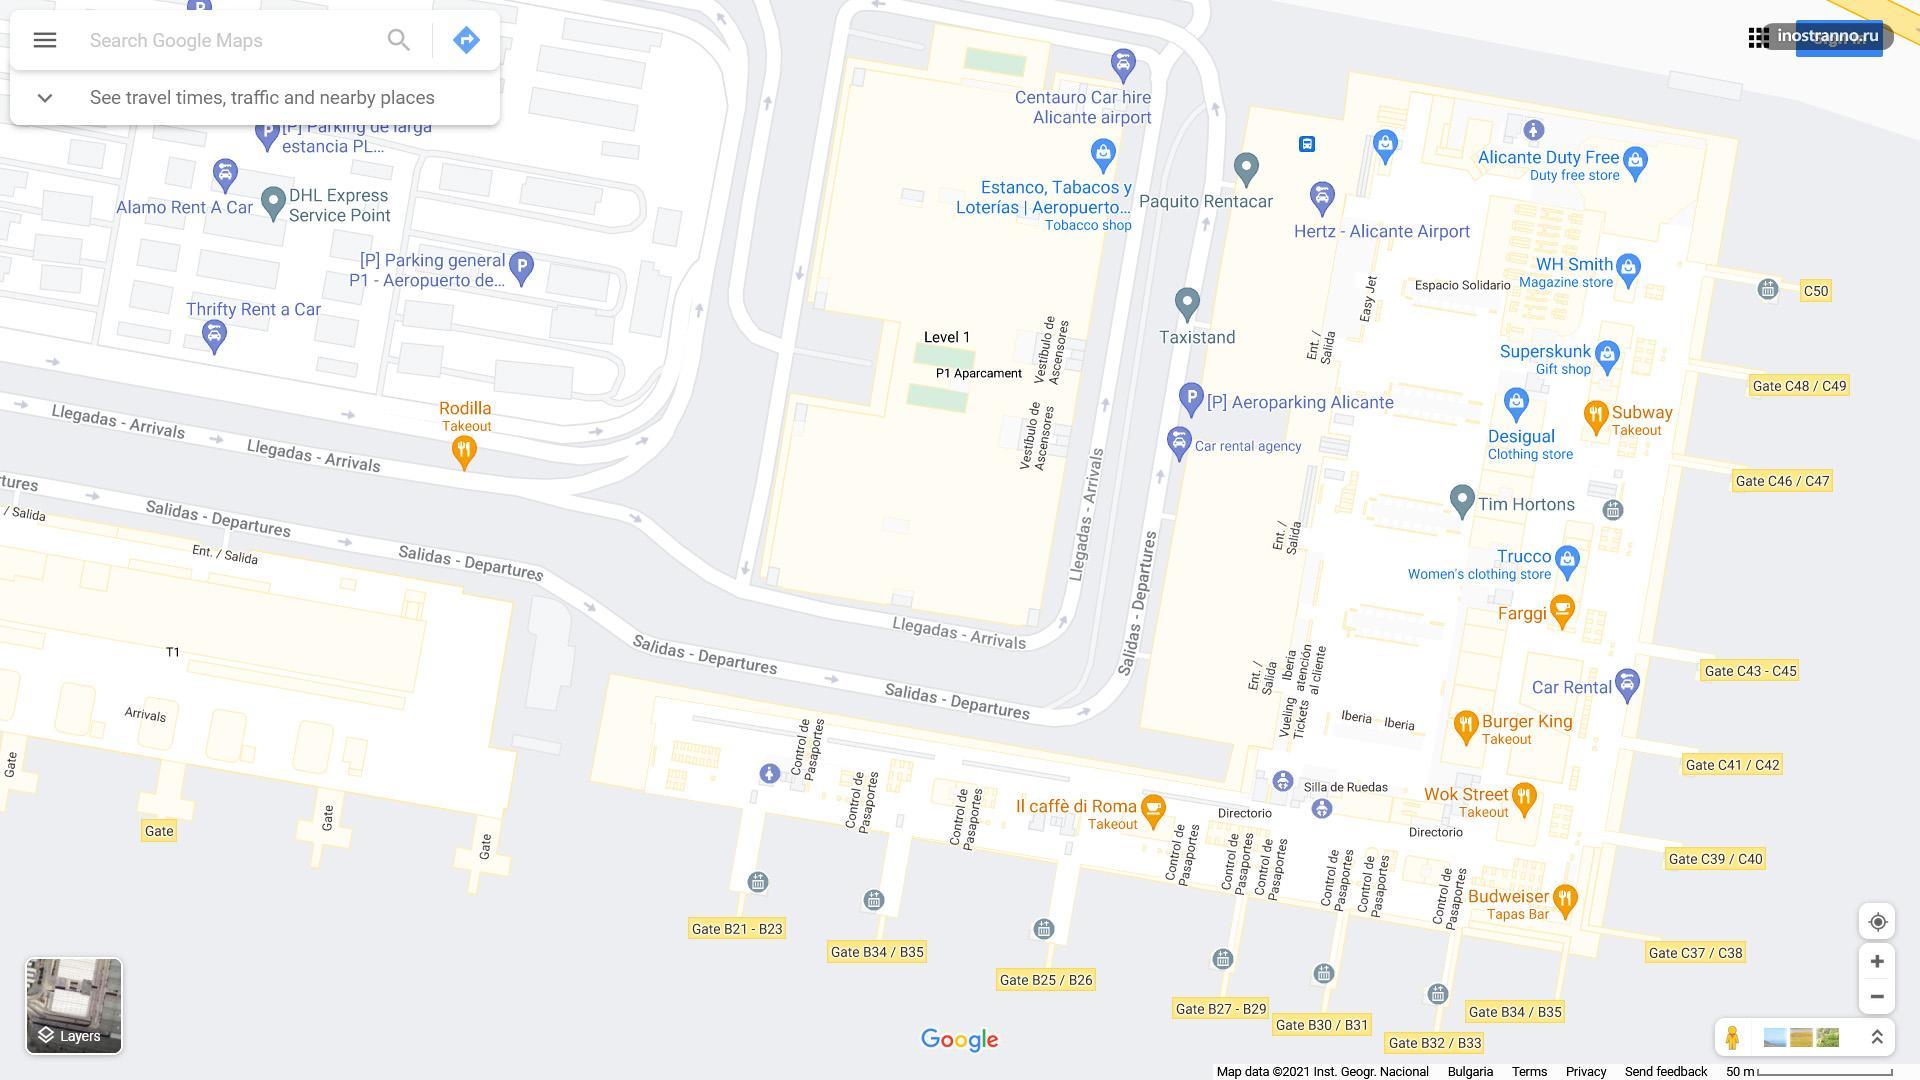 Аликанте аэропорт карта схема терминала